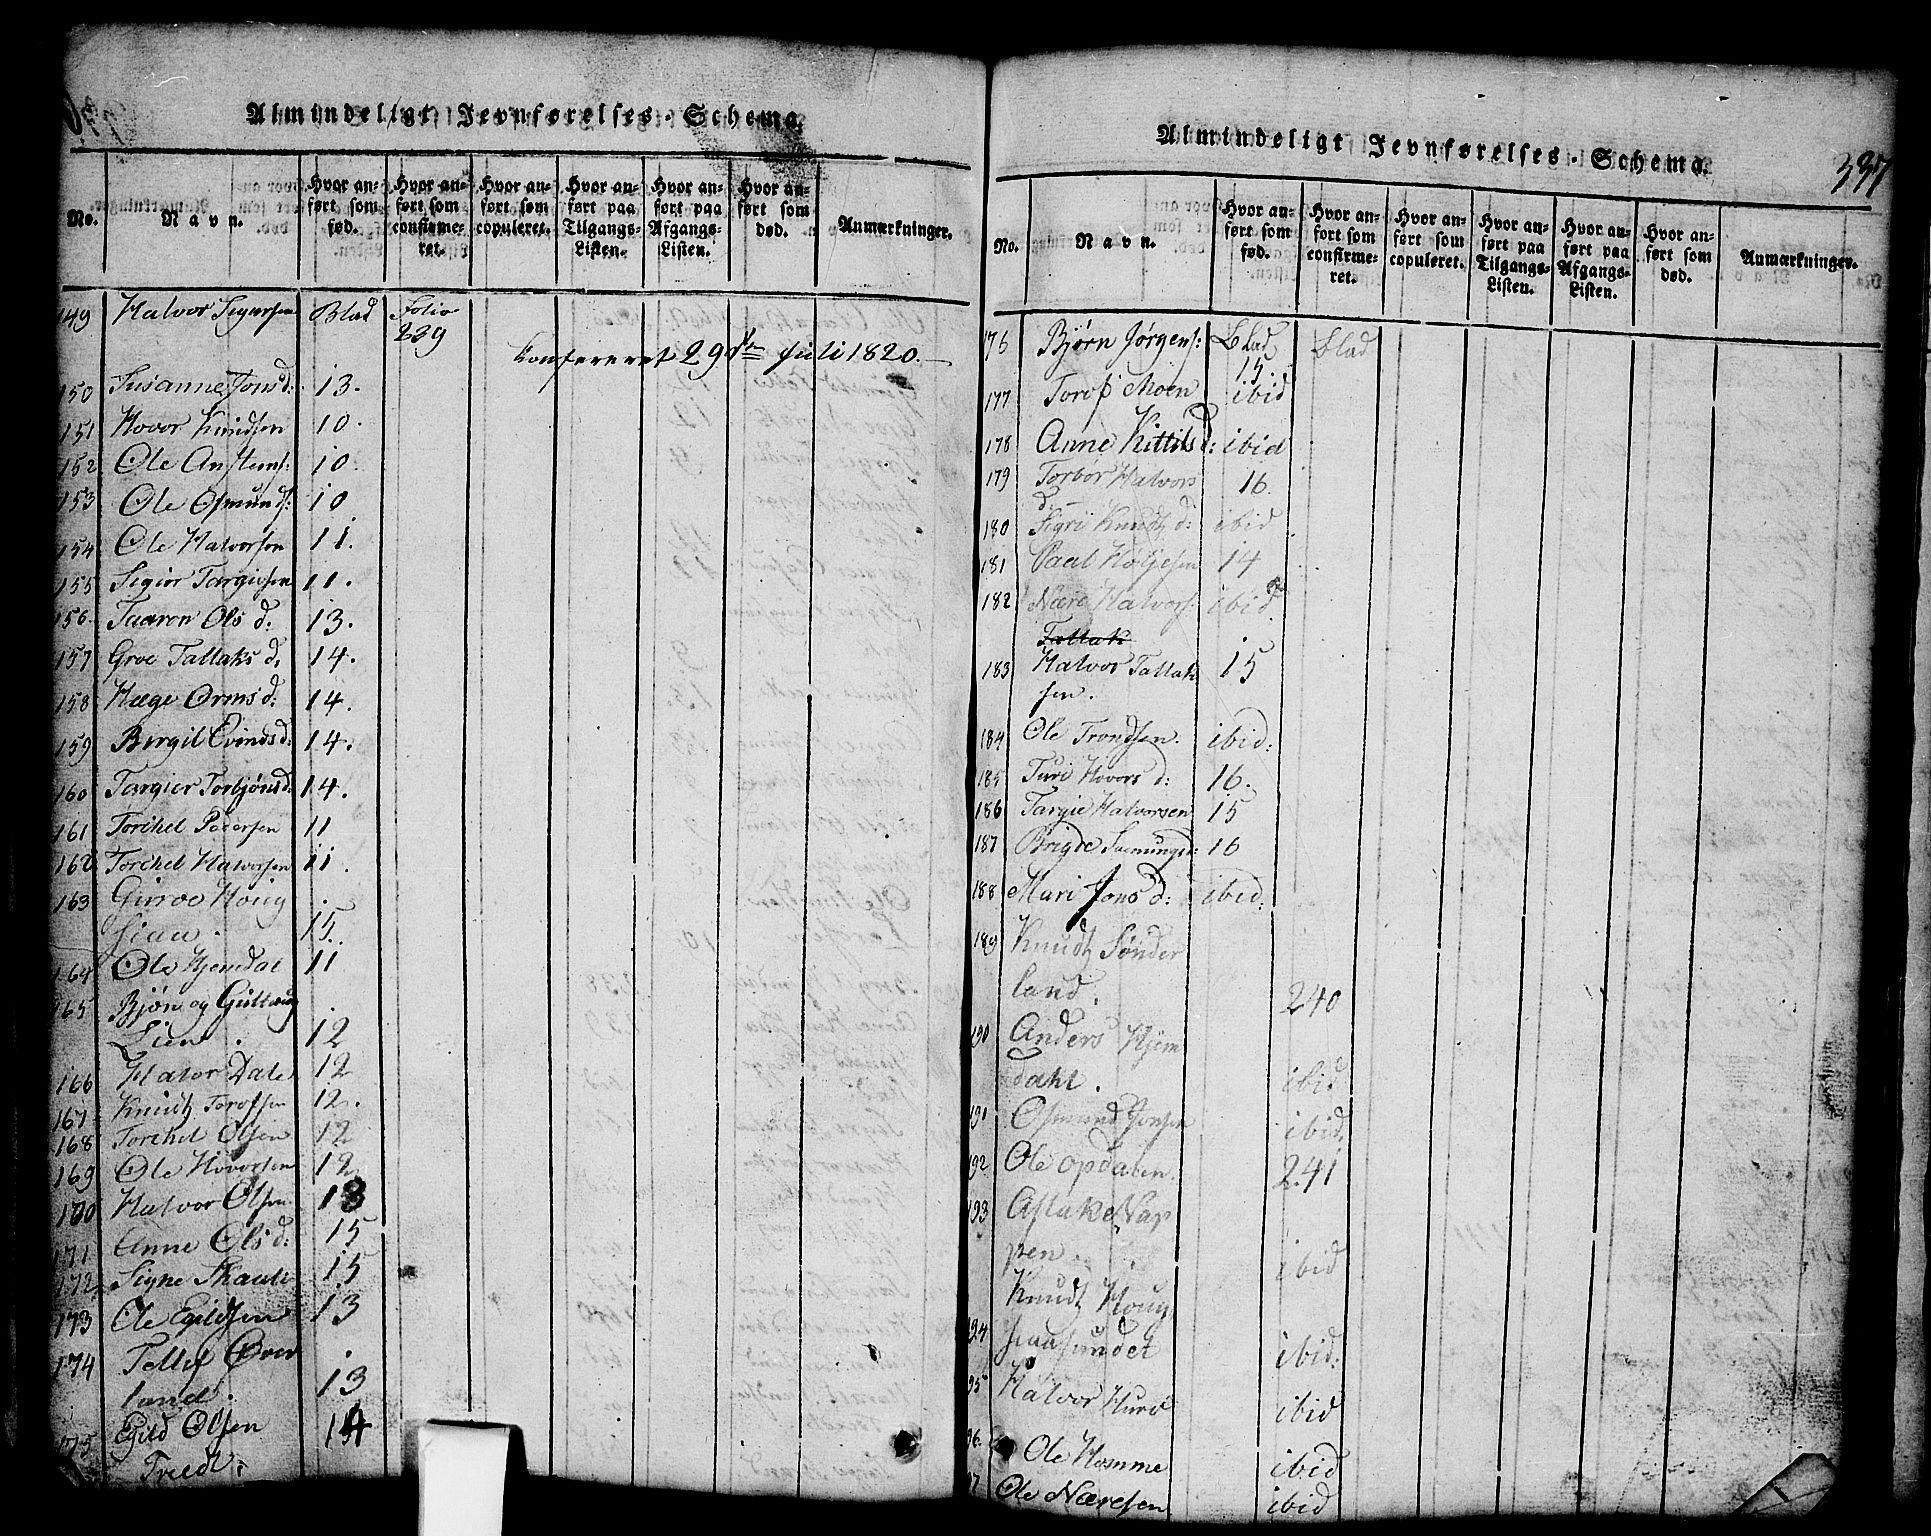 SAKO, Nissedal kirkebøker, G/Gb/L0001: Klokkerbok nr. II 1, 1814-1862, s. 337